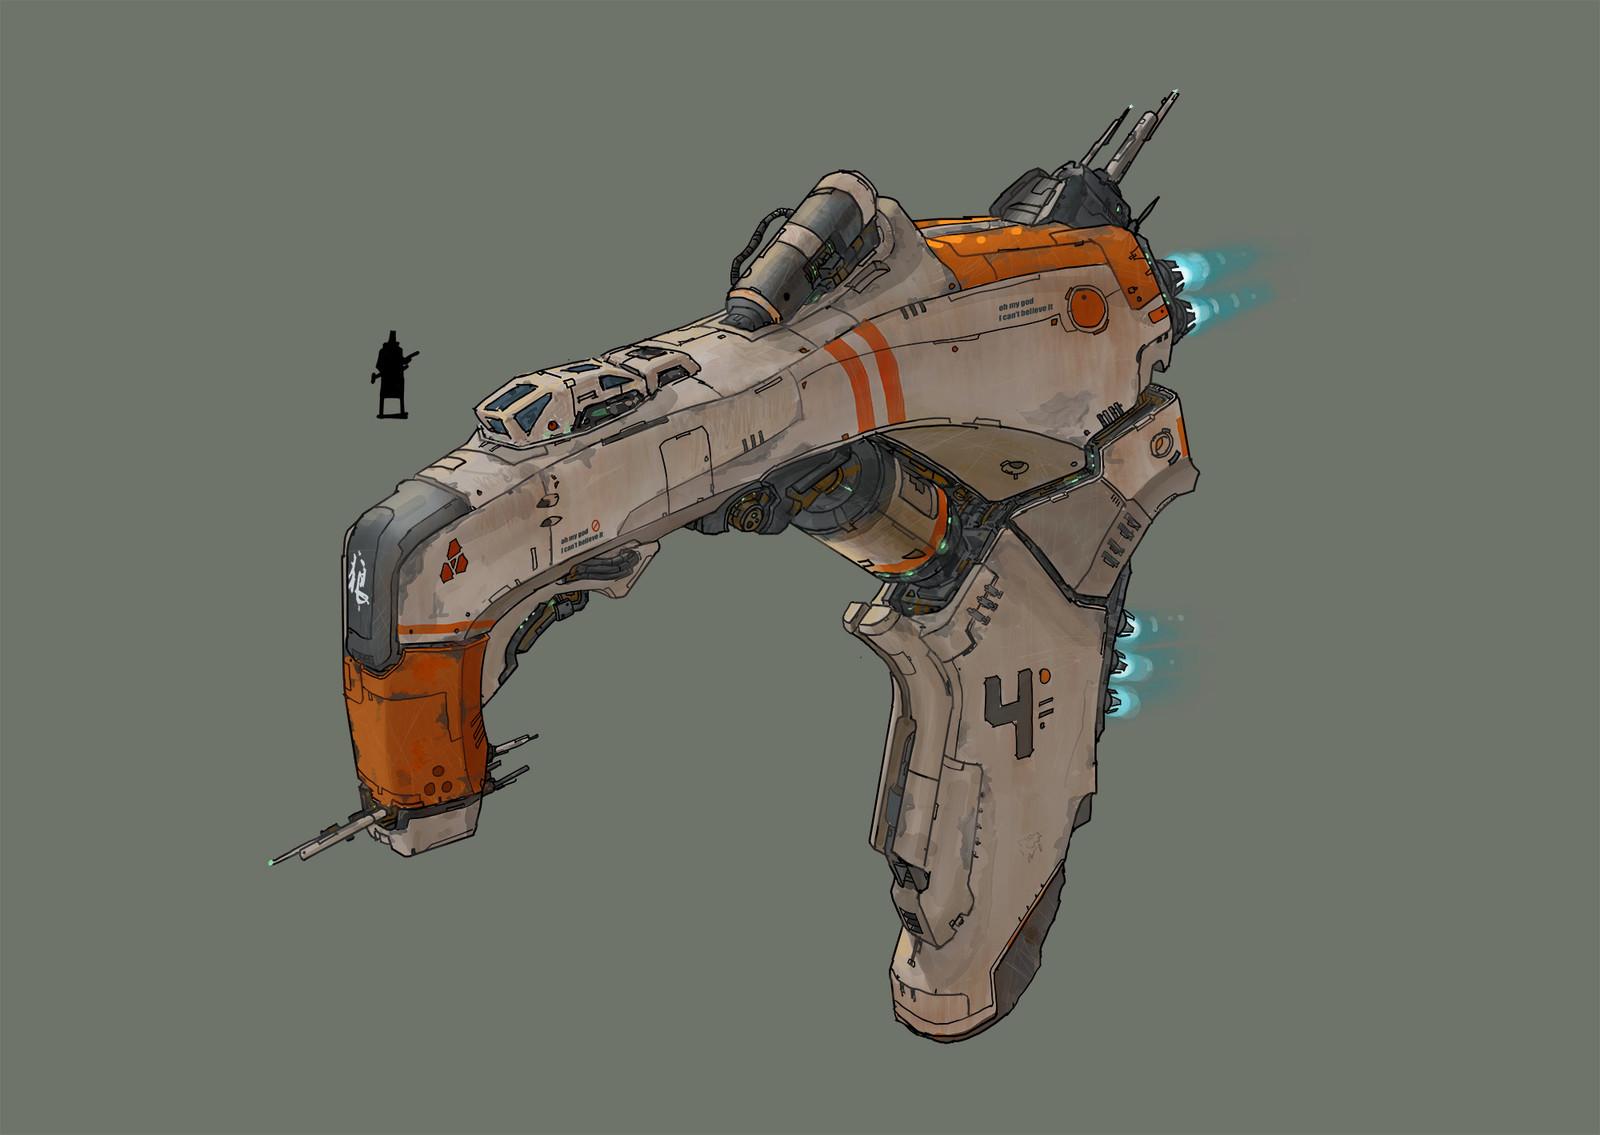 spaceship practice